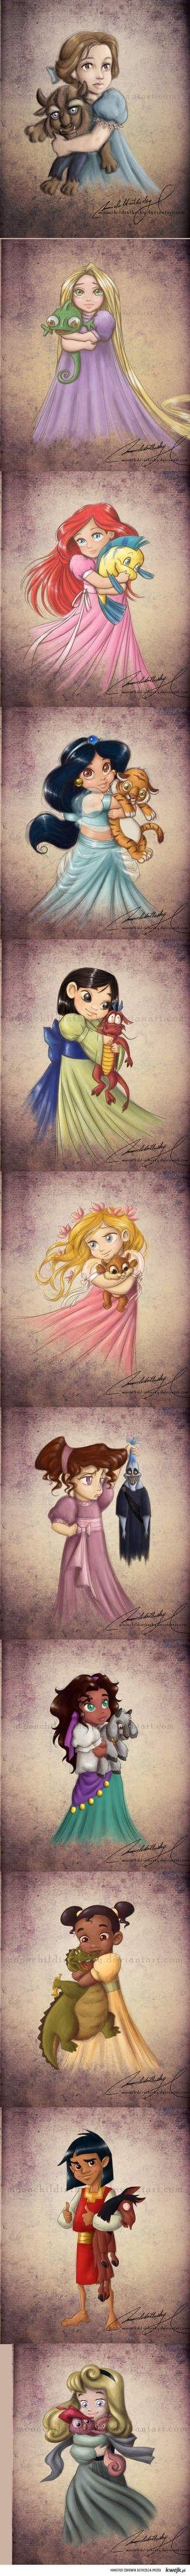 I love this!!! Super cute.  disney princess as babies